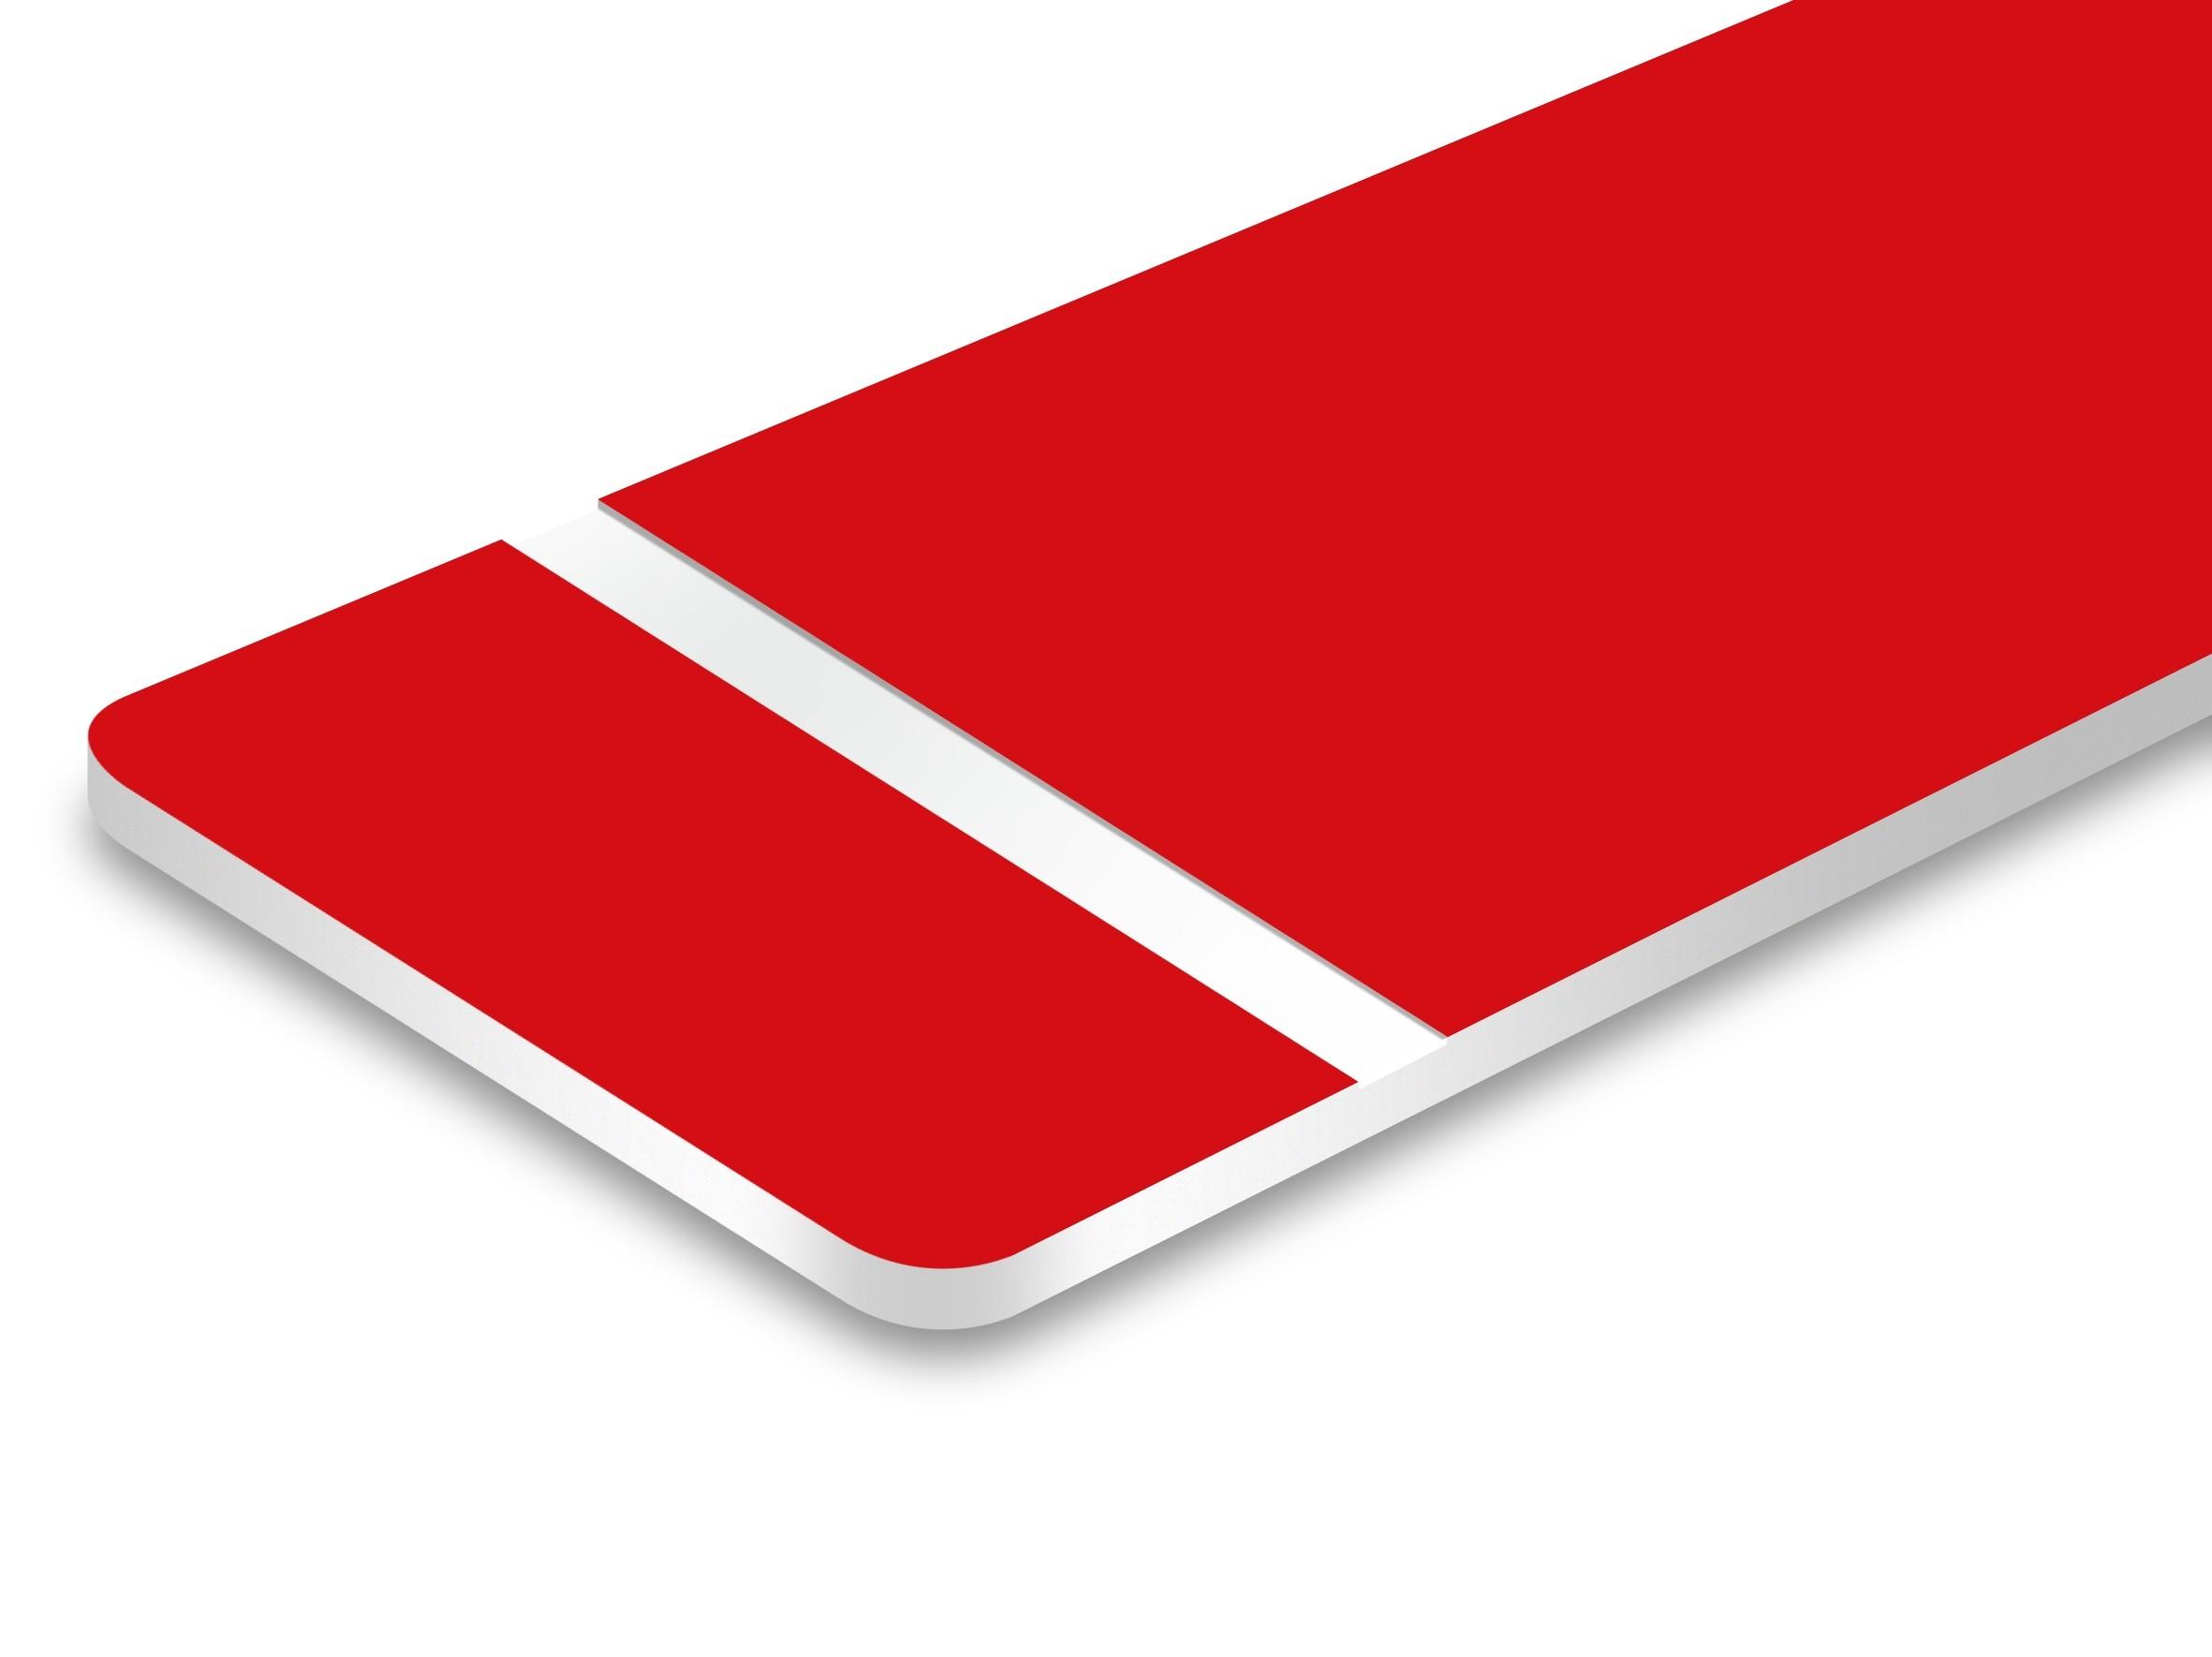 TroLase Ultra mat rouge/blanc 1,5 mm